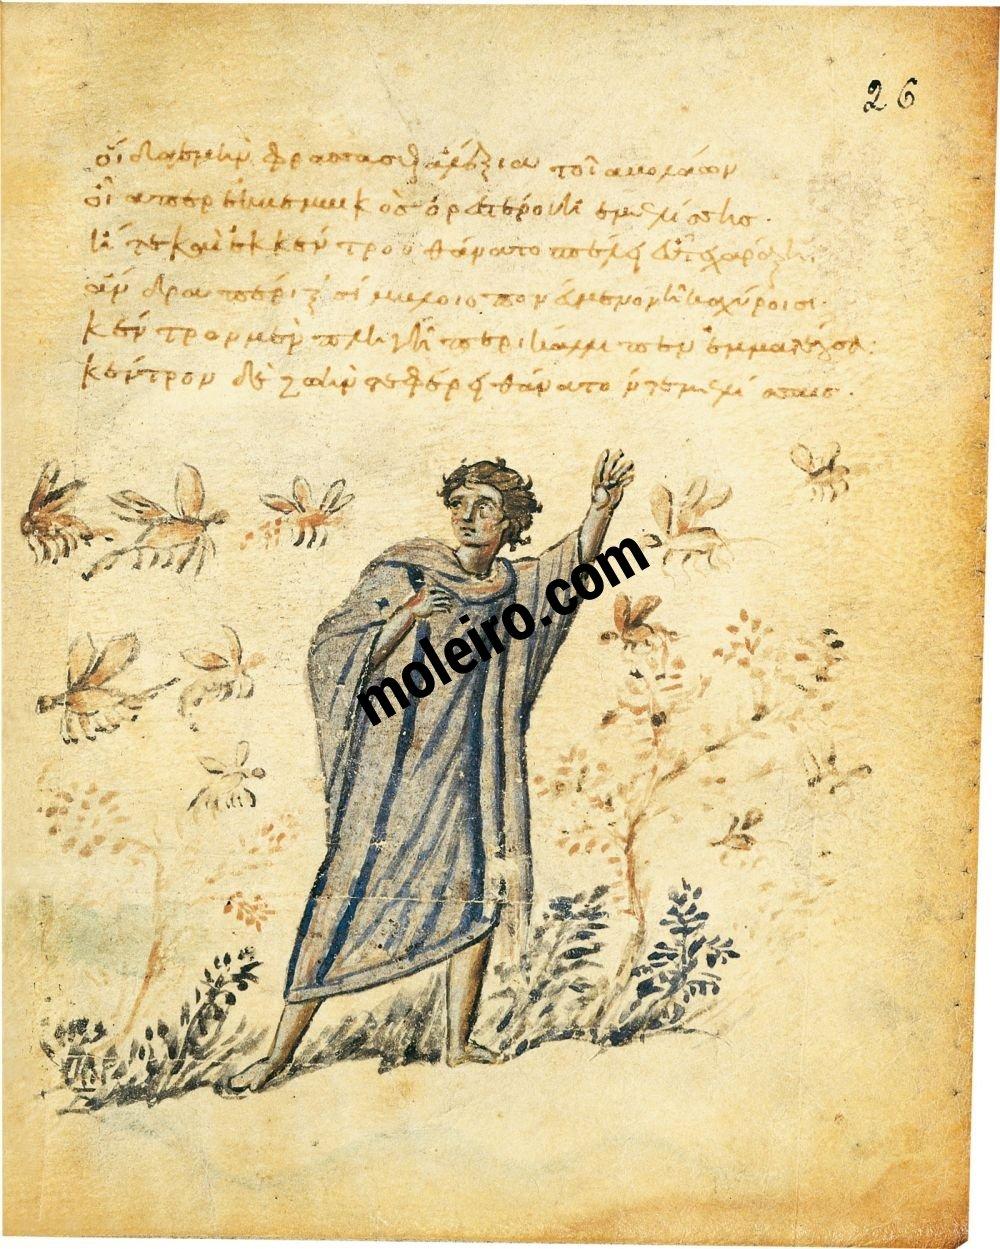 Theriaka e Alexipharmaka, di Nicandro folio 26r